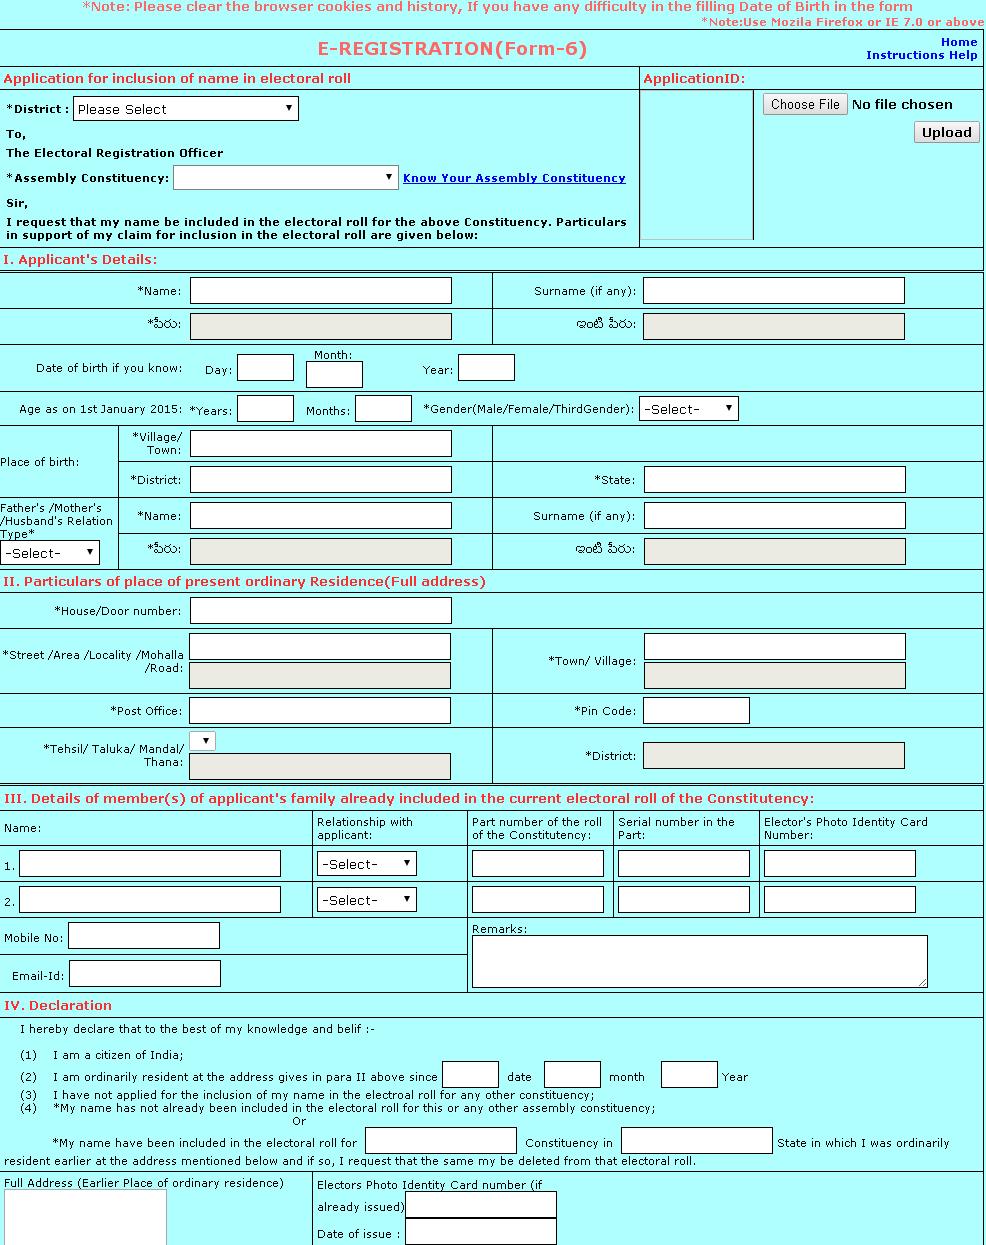 Online color voter id - Application Form 6